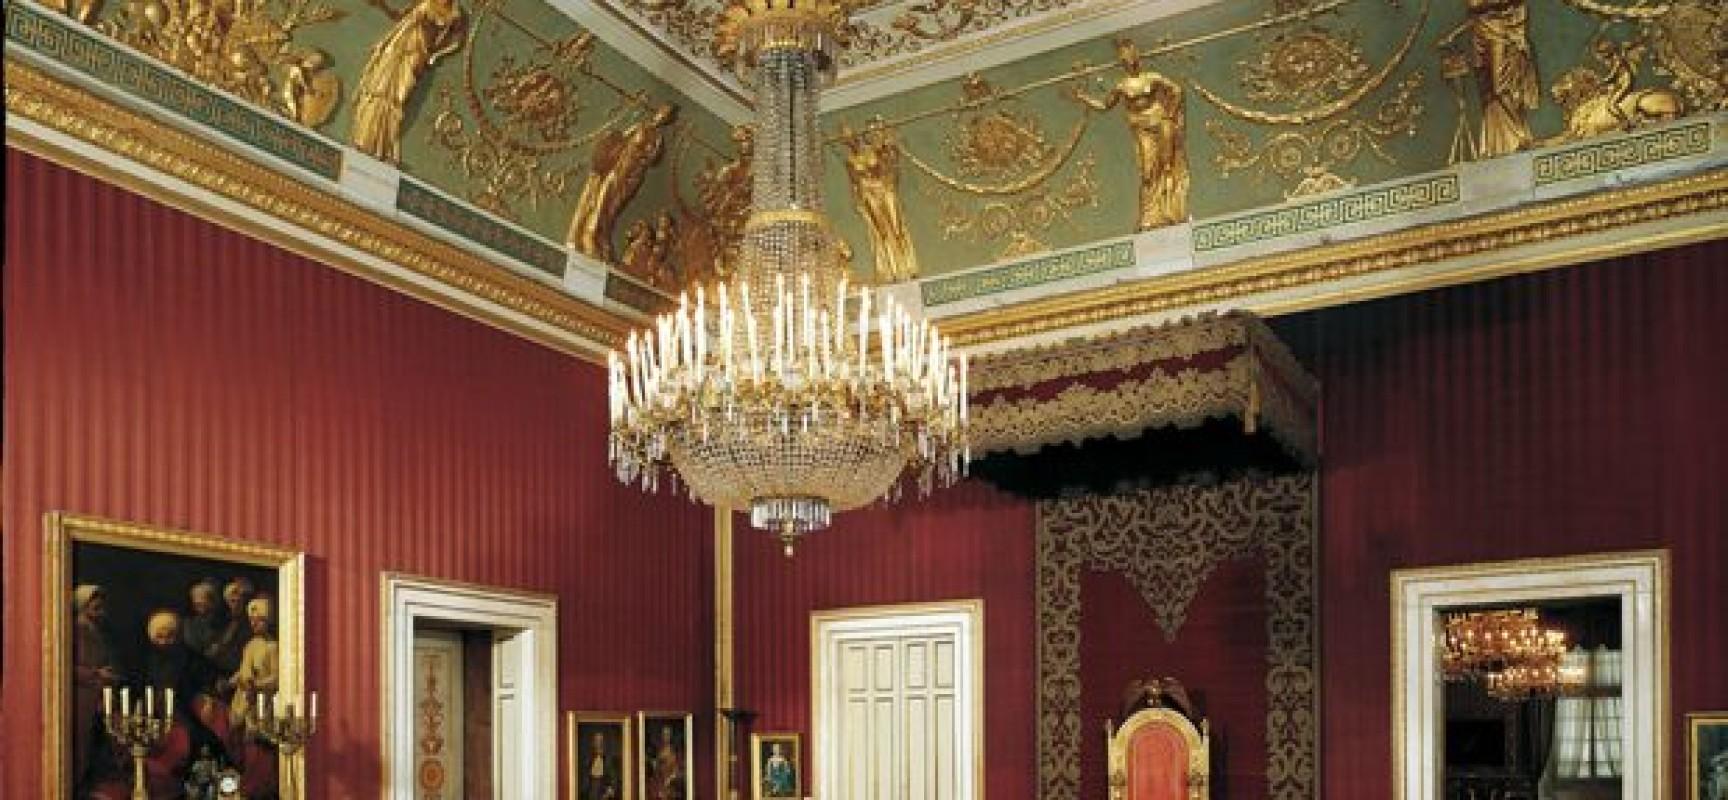 Palazzo Reale mostra 2201 esplosioni nucleari